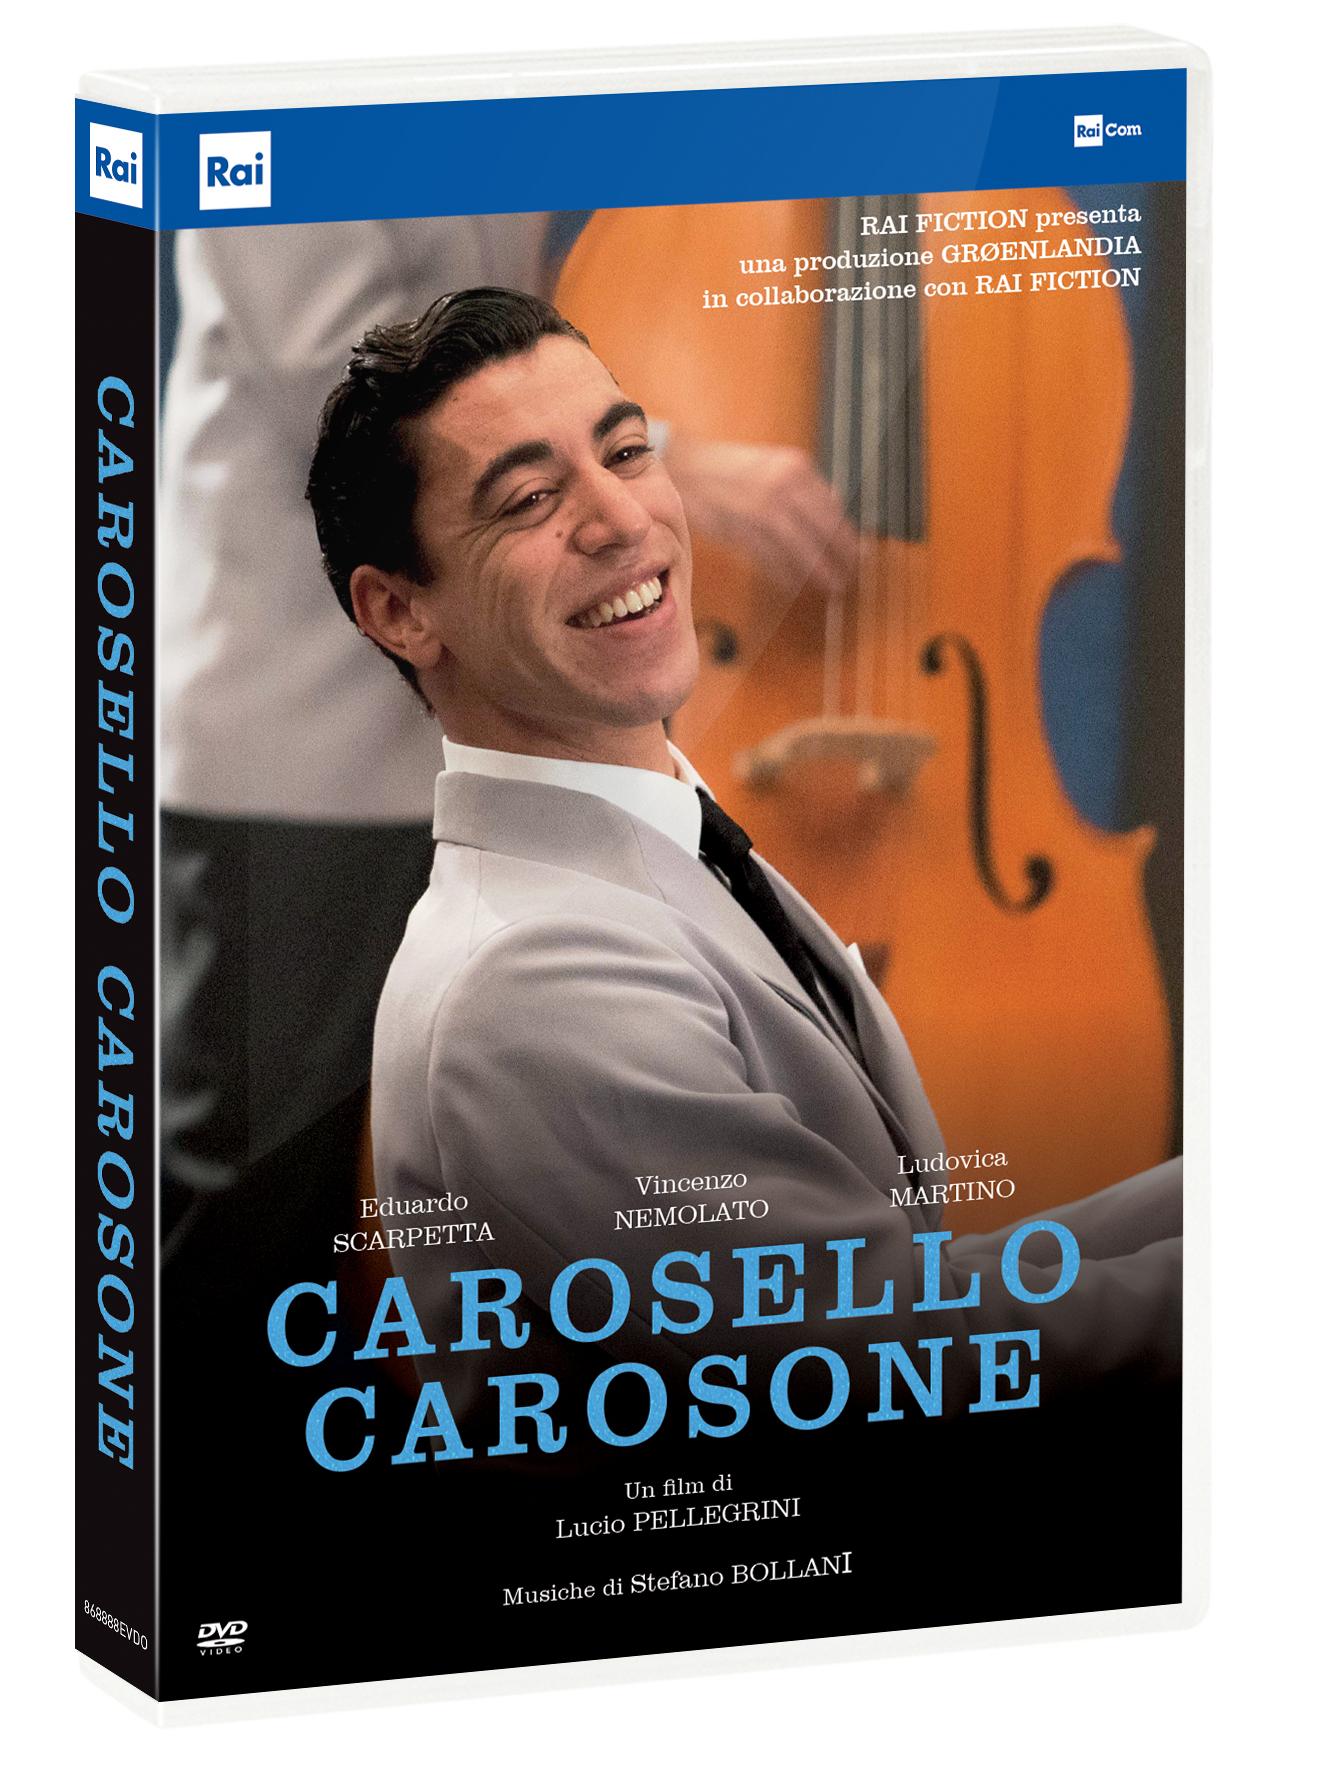 COF.CAROSELLO CAROSONE (2 DVD) (DVD)